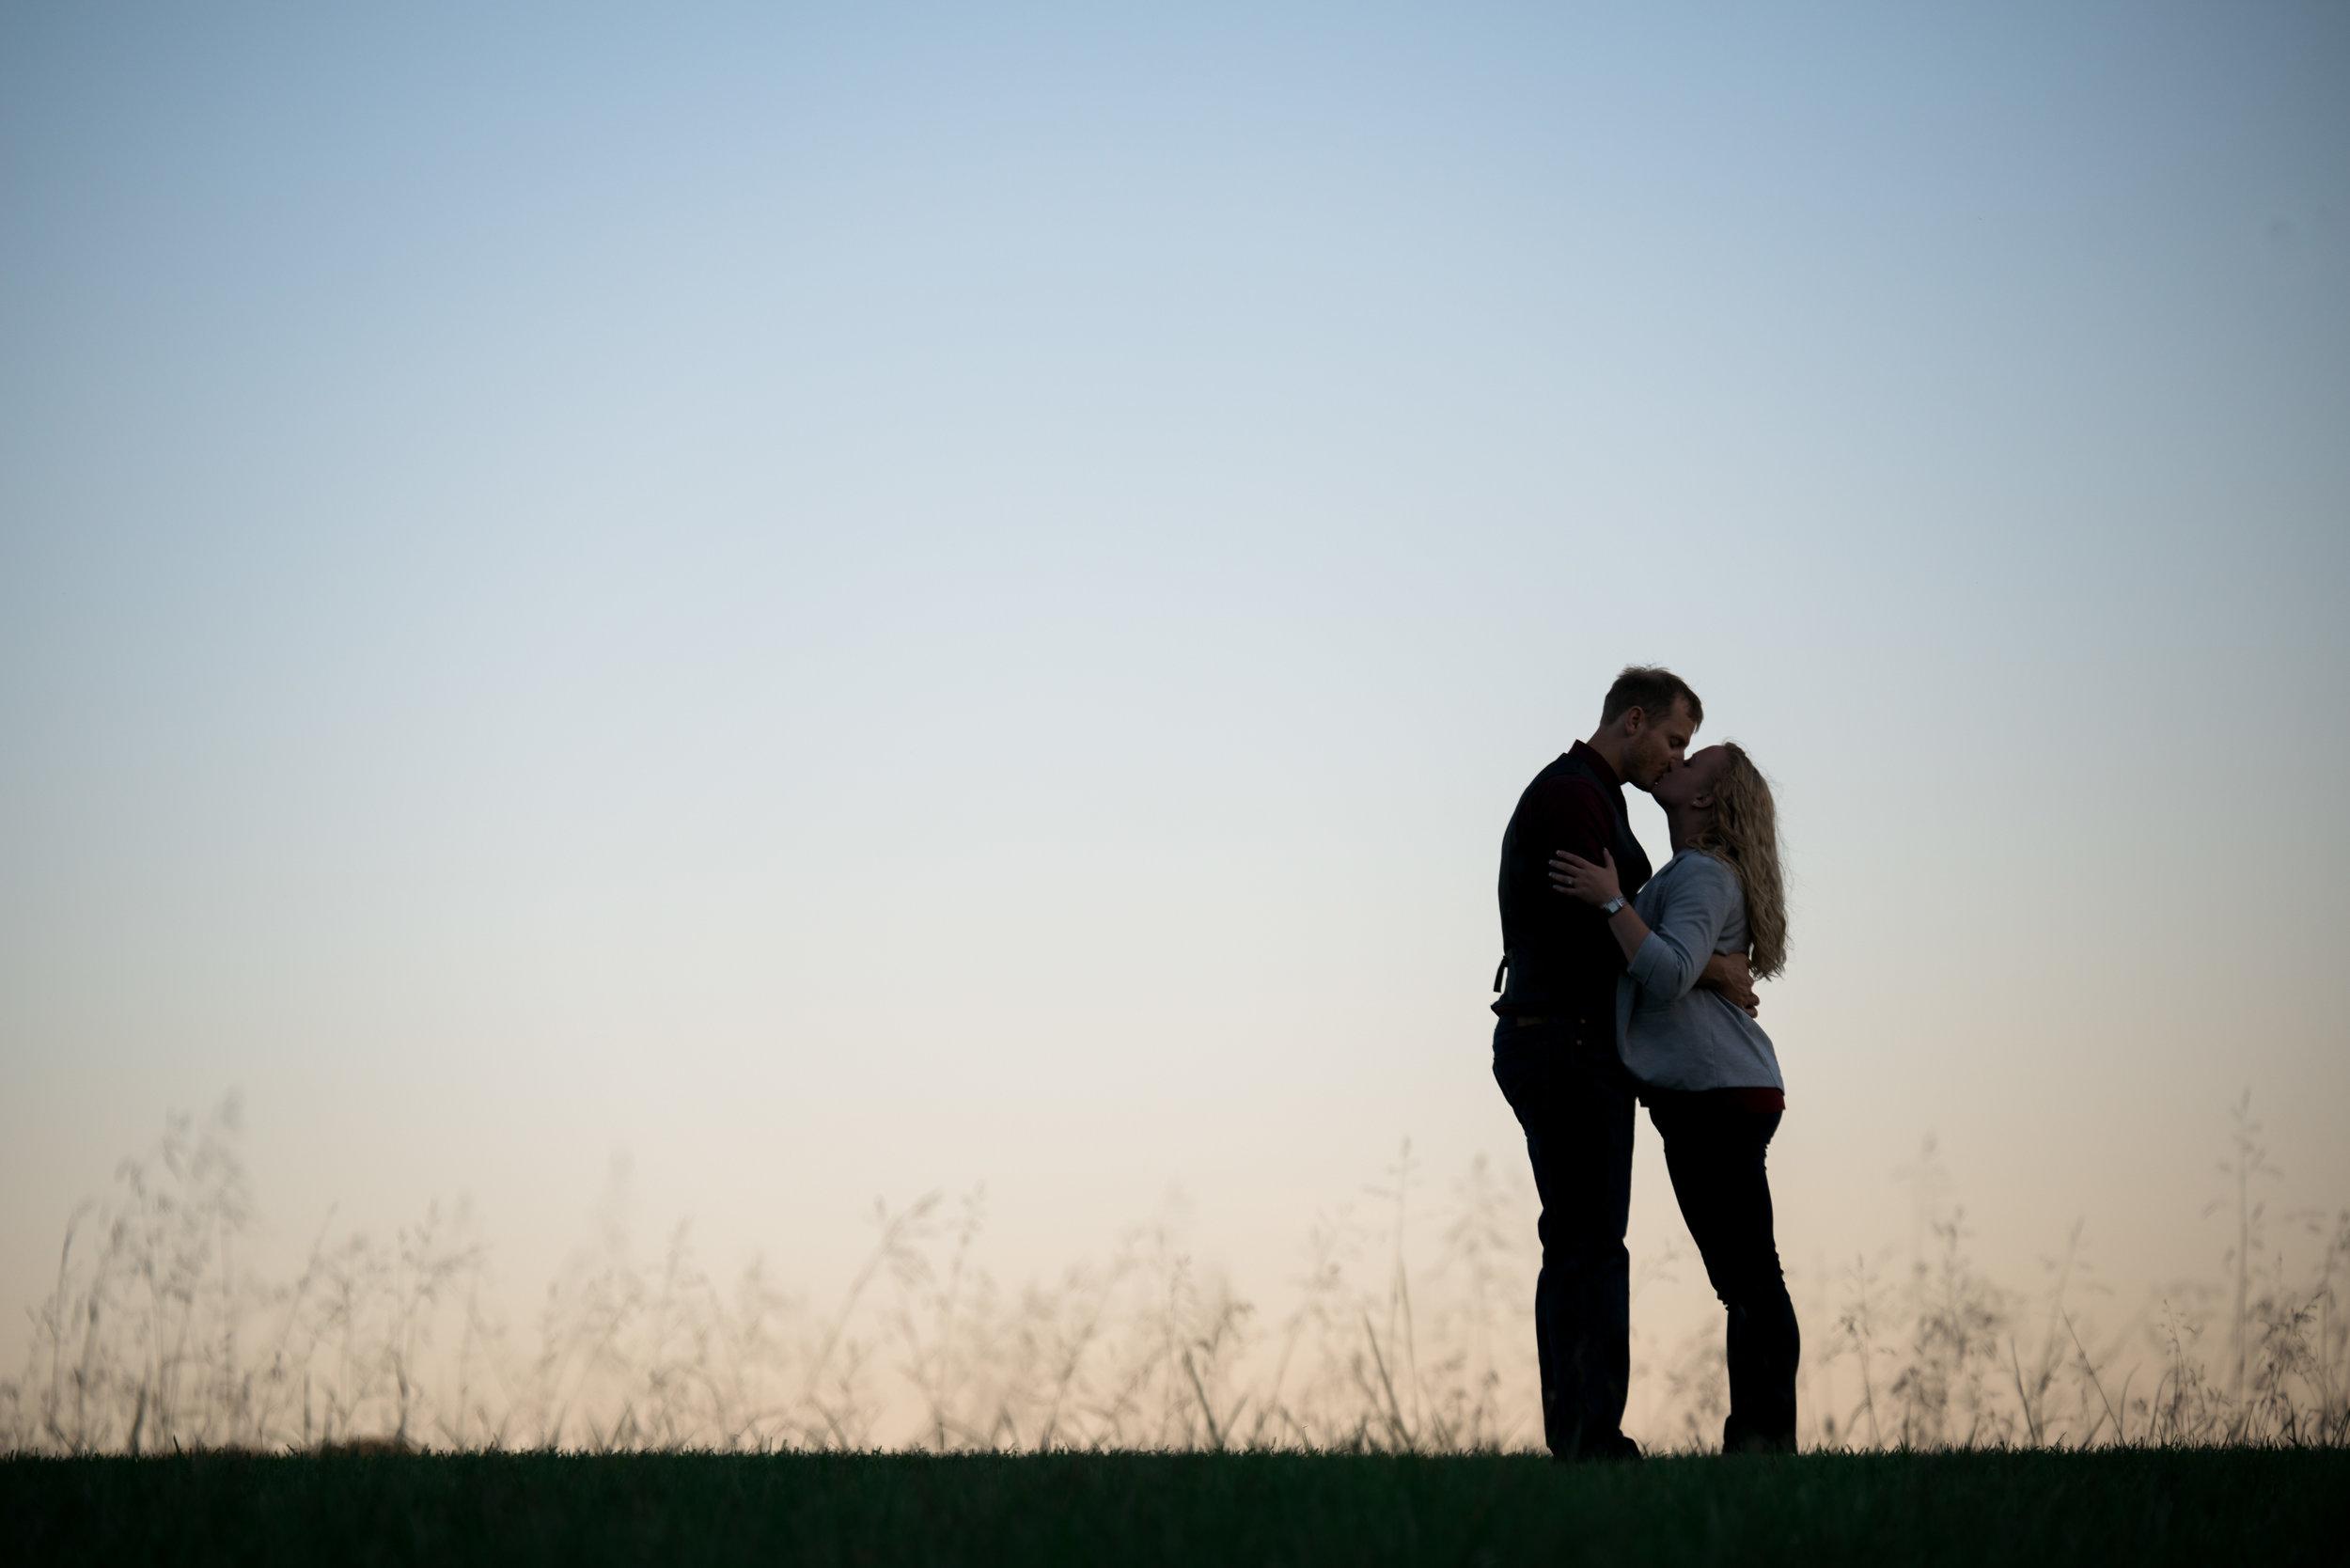 Lynchburg_College_Sorella_Farms_Baseball_Ballet_Virginia_Engagement_Session_Wedding_Photographers (80).jpg